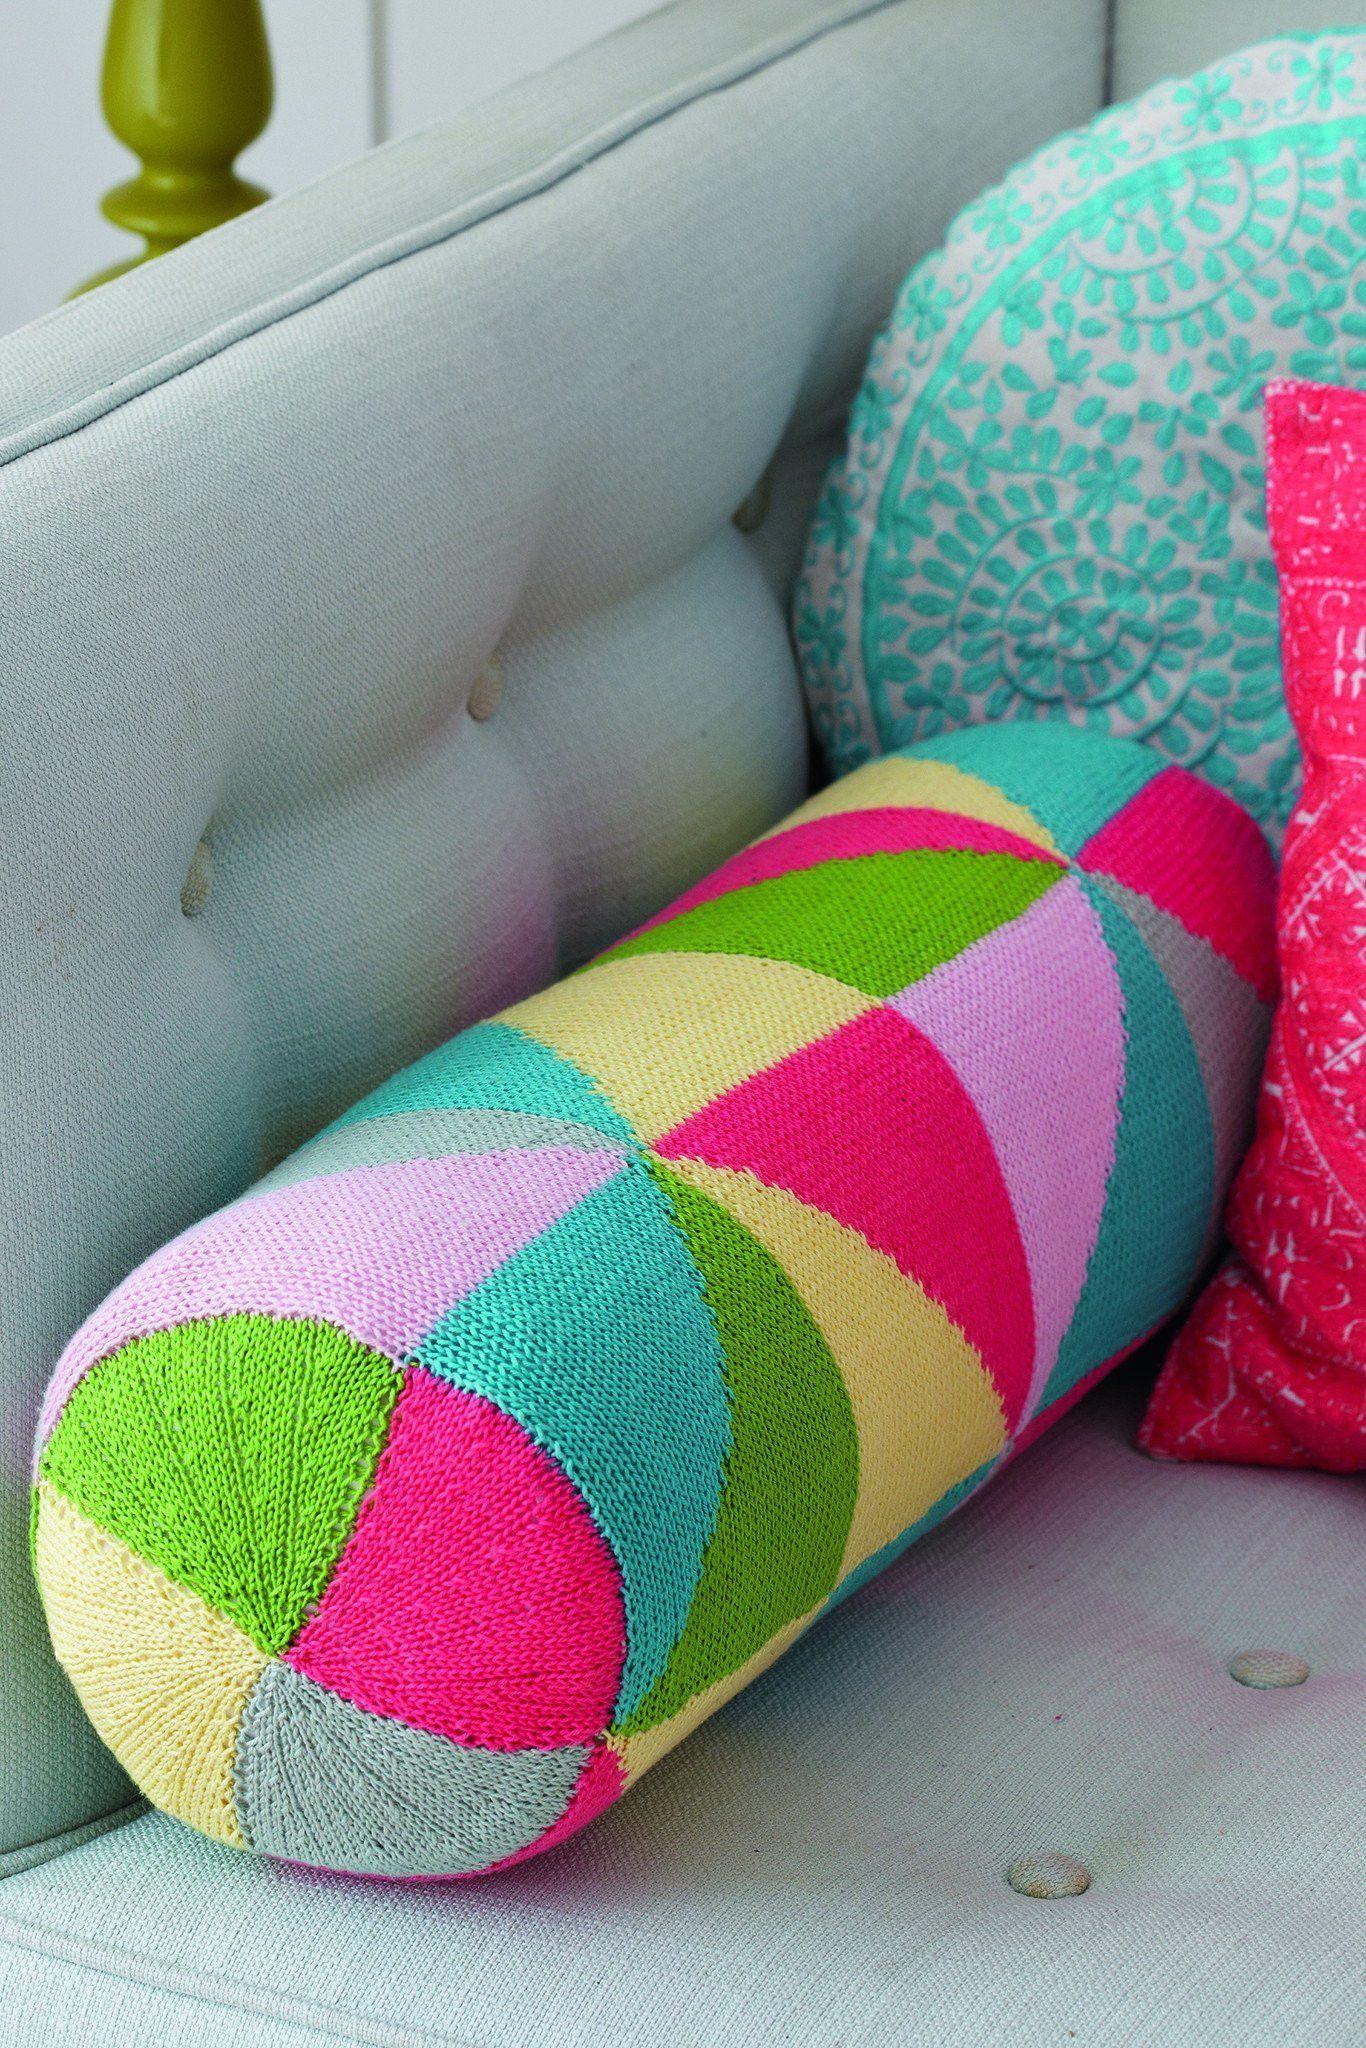 Geometric Bolster Cushion Cover Knitting Pattern   The ...